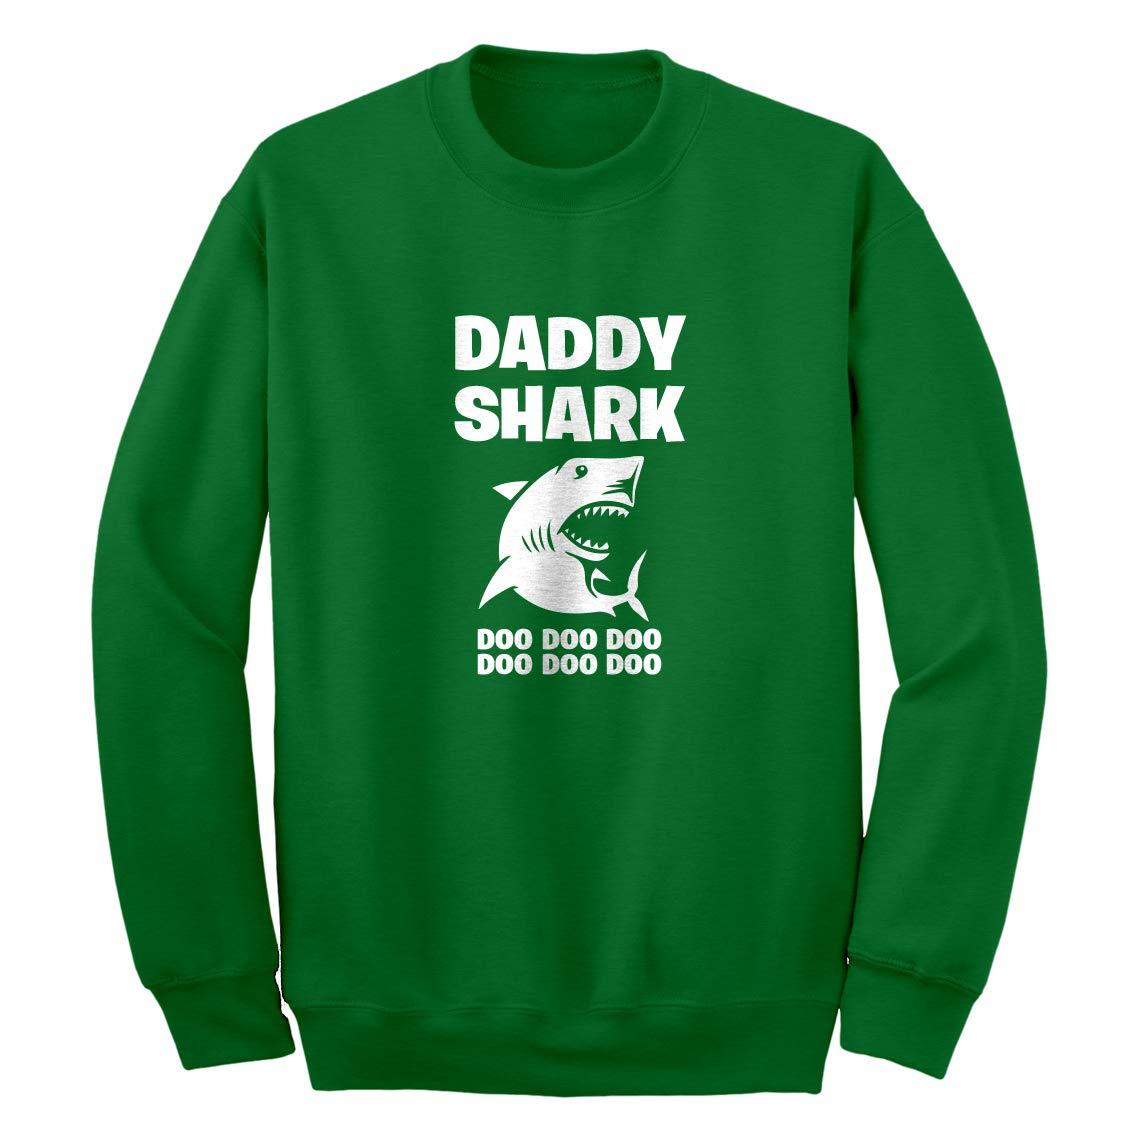 Indica Plateau Daddy Shark Unisex Adult Sweatshirt 3757-C